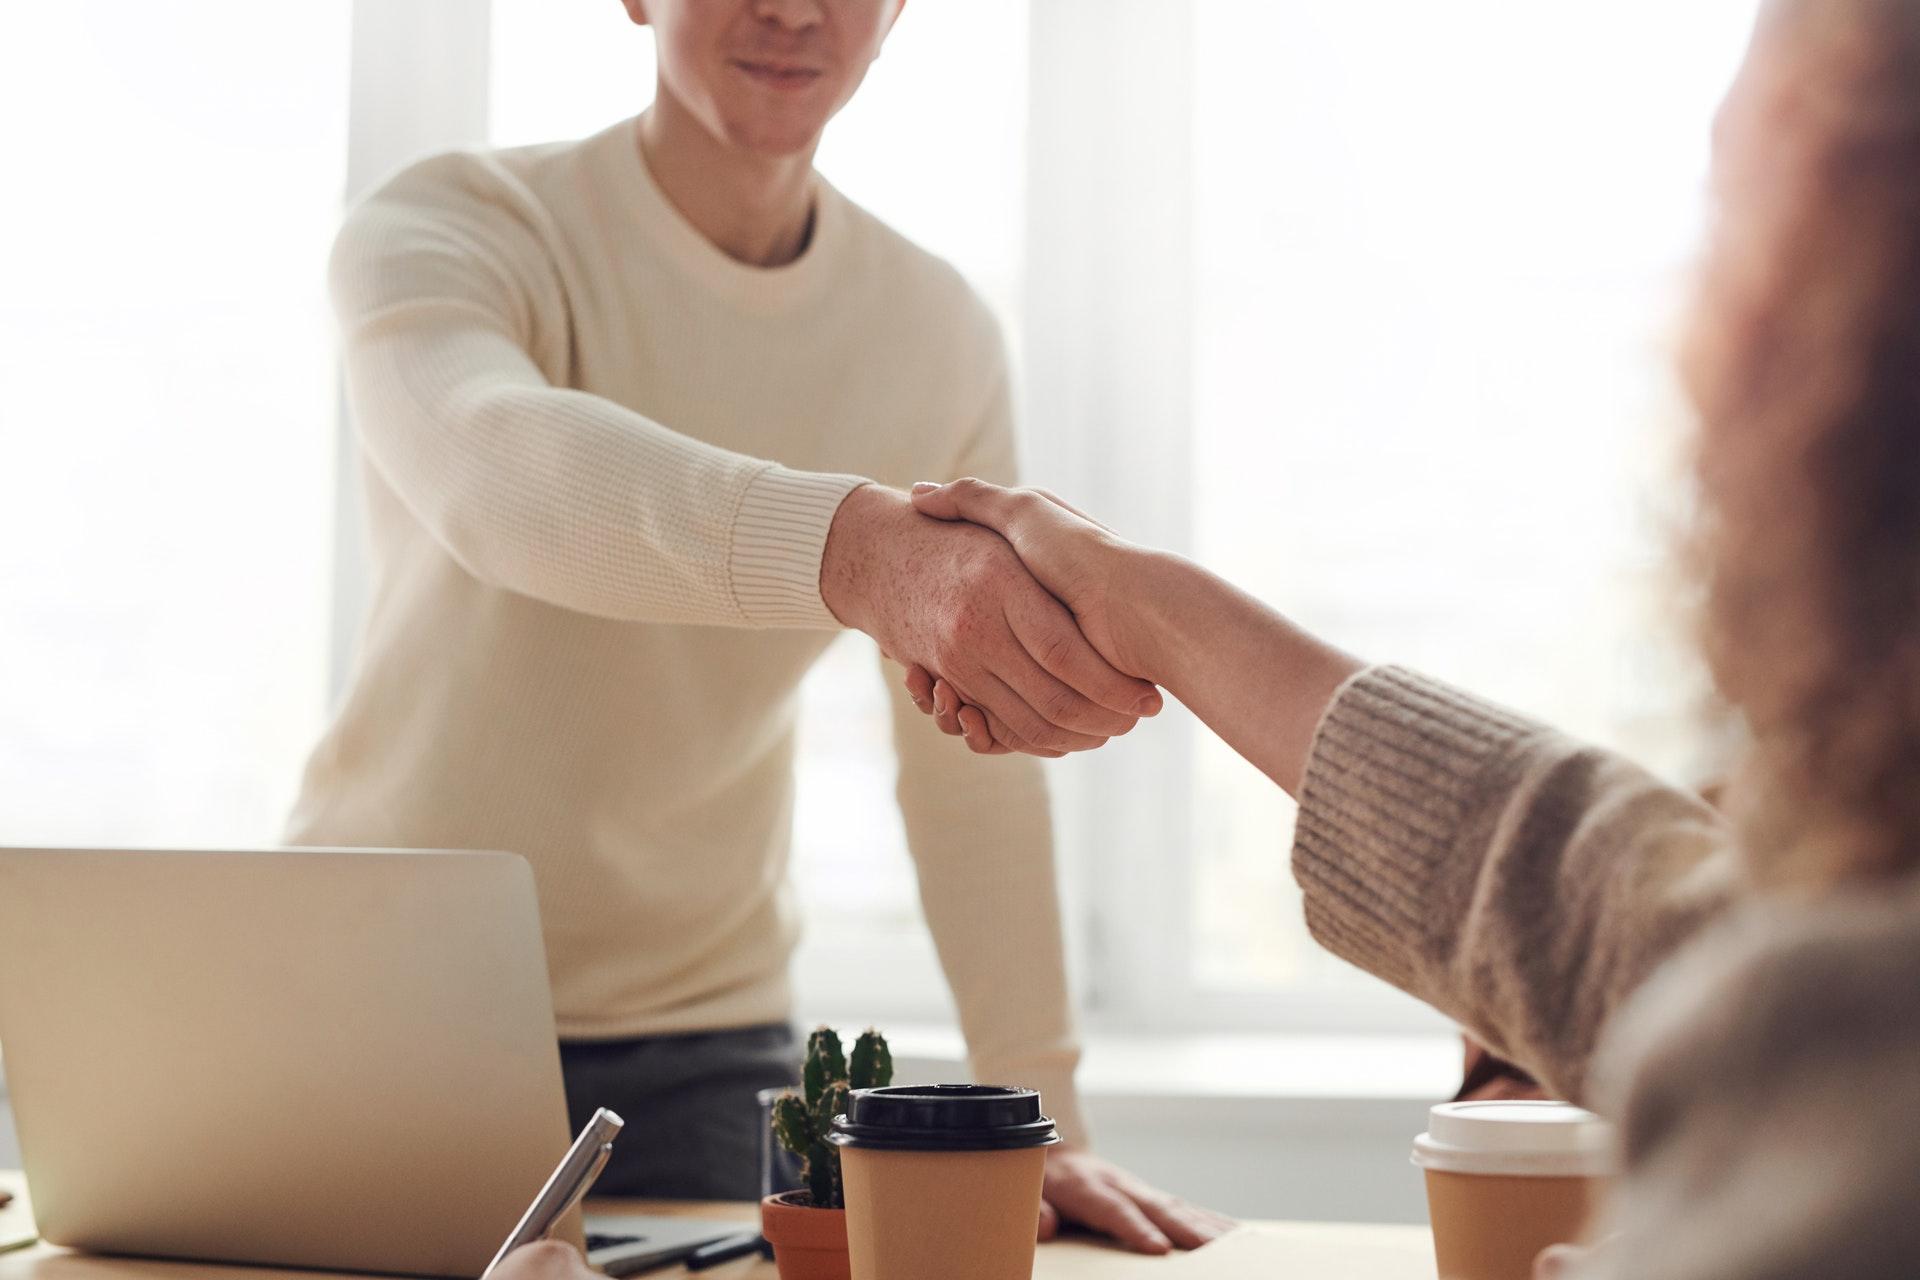 SPAC mergers agreement